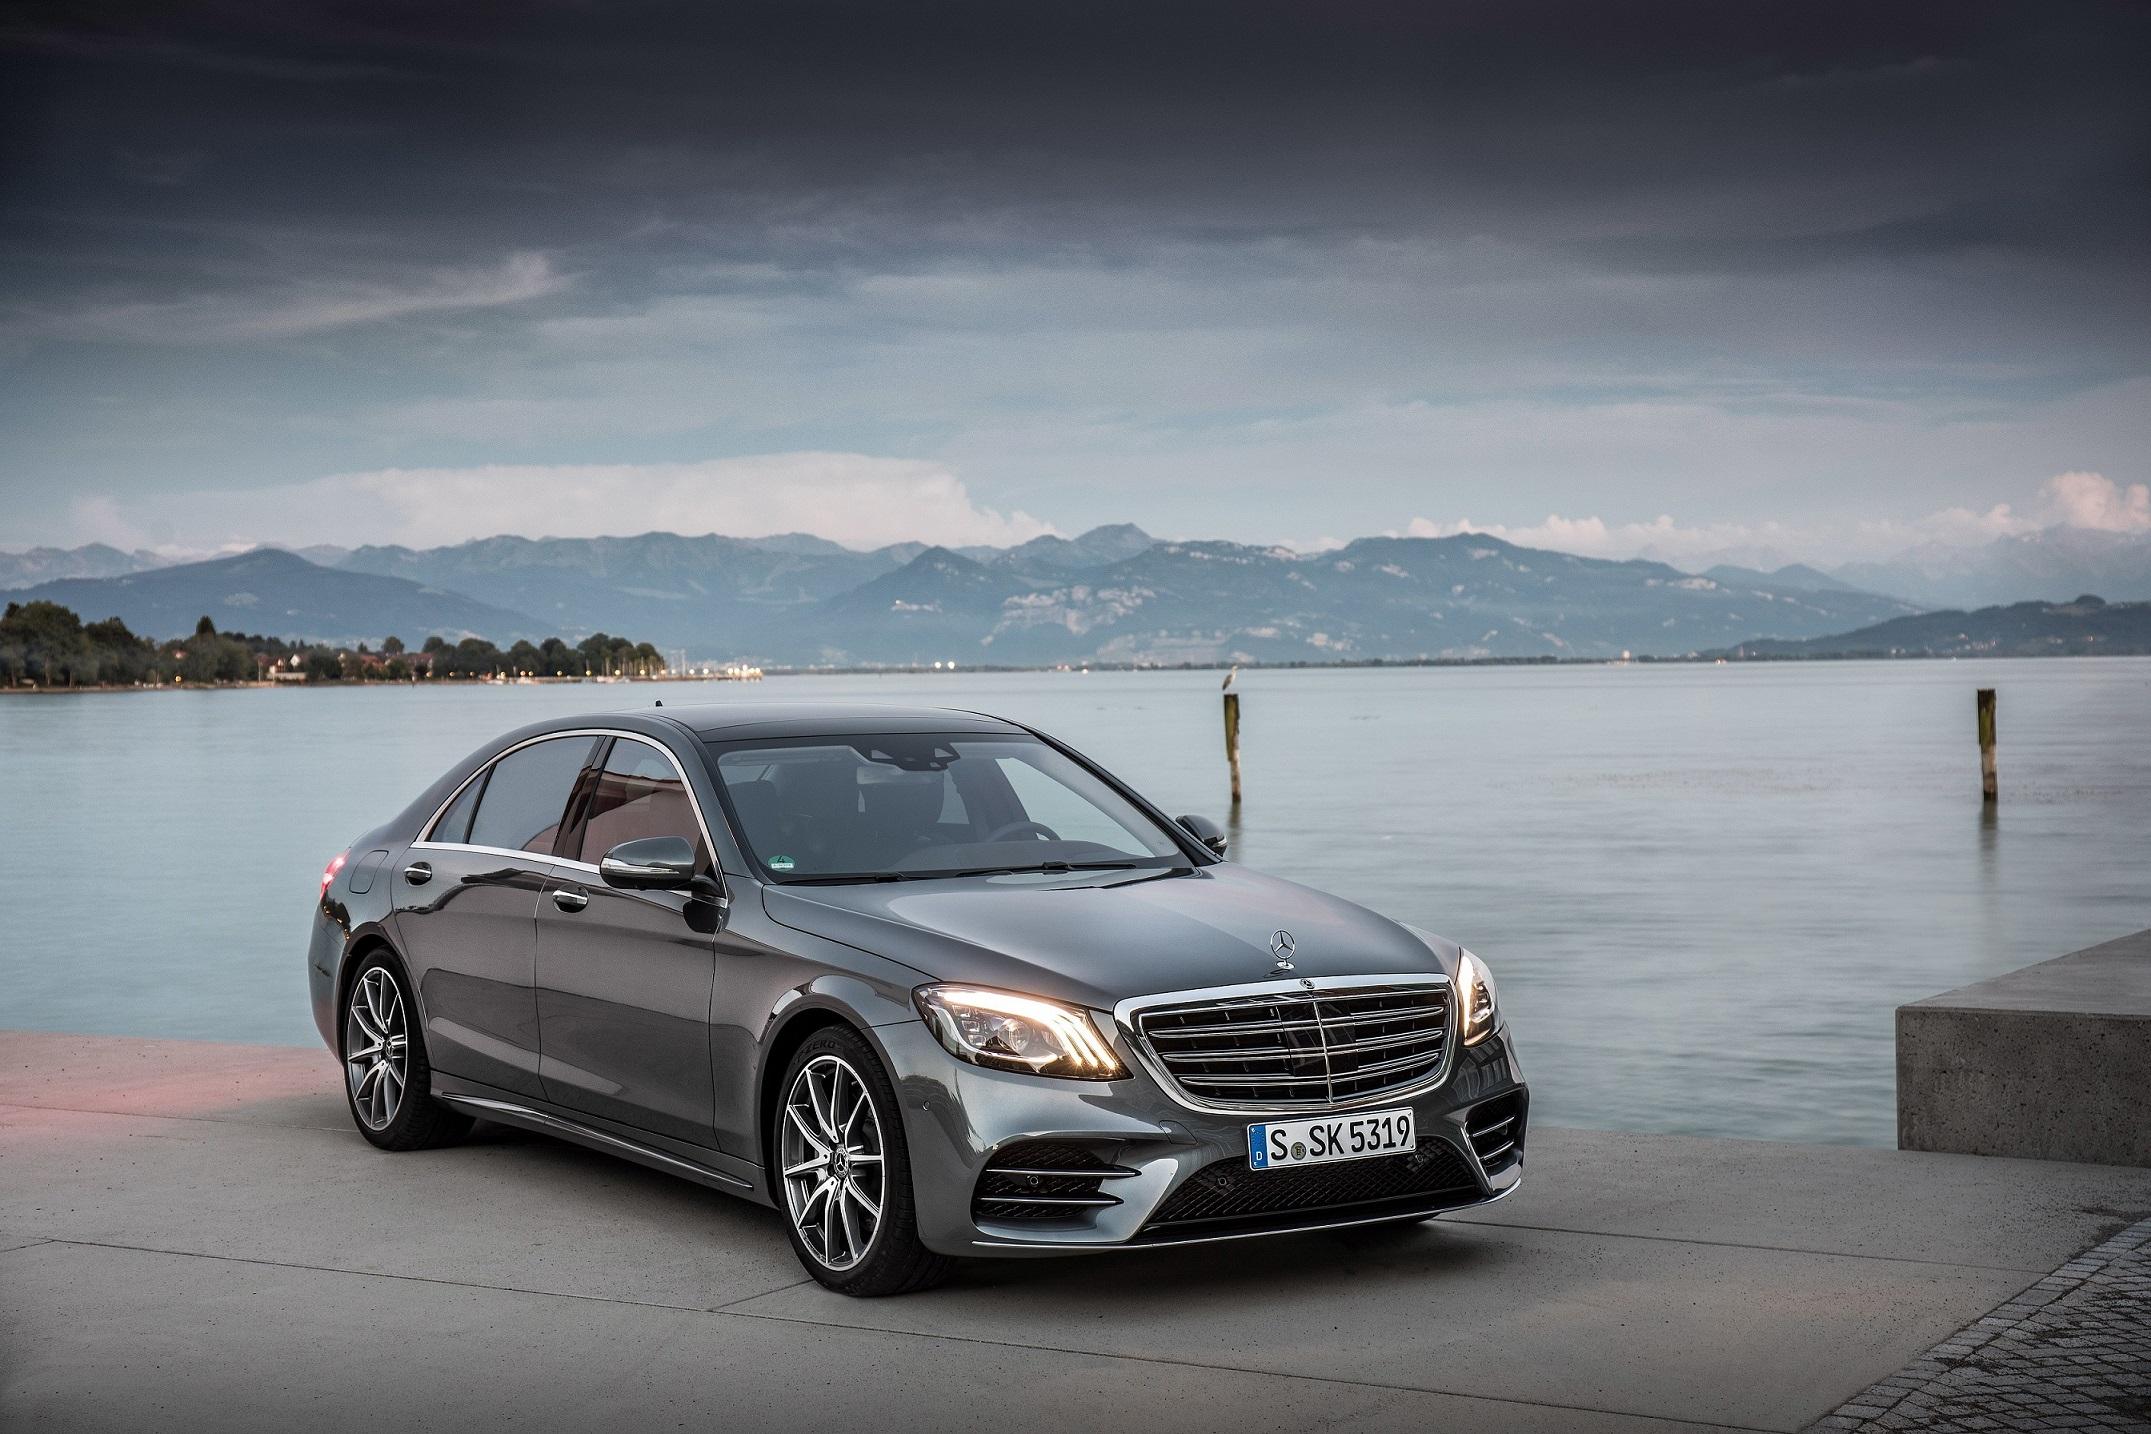 Mercedes-Benz S 500, selenitgrau metallic, Leder Exklusiv Nappa magmagrau/espressobraun;Kraftstoffverbrauch kombiniert: 6,6 l/100 km; CO2-Emissionen kombiniert: 150 g/km*  Mercedes-Benz S 500, selenite grey metallic, exclusive nappa leather magma grey/espresso brown;fuel consumption combined: 6.6 l/100 km; combined CO2 emissions: 150 g/km*